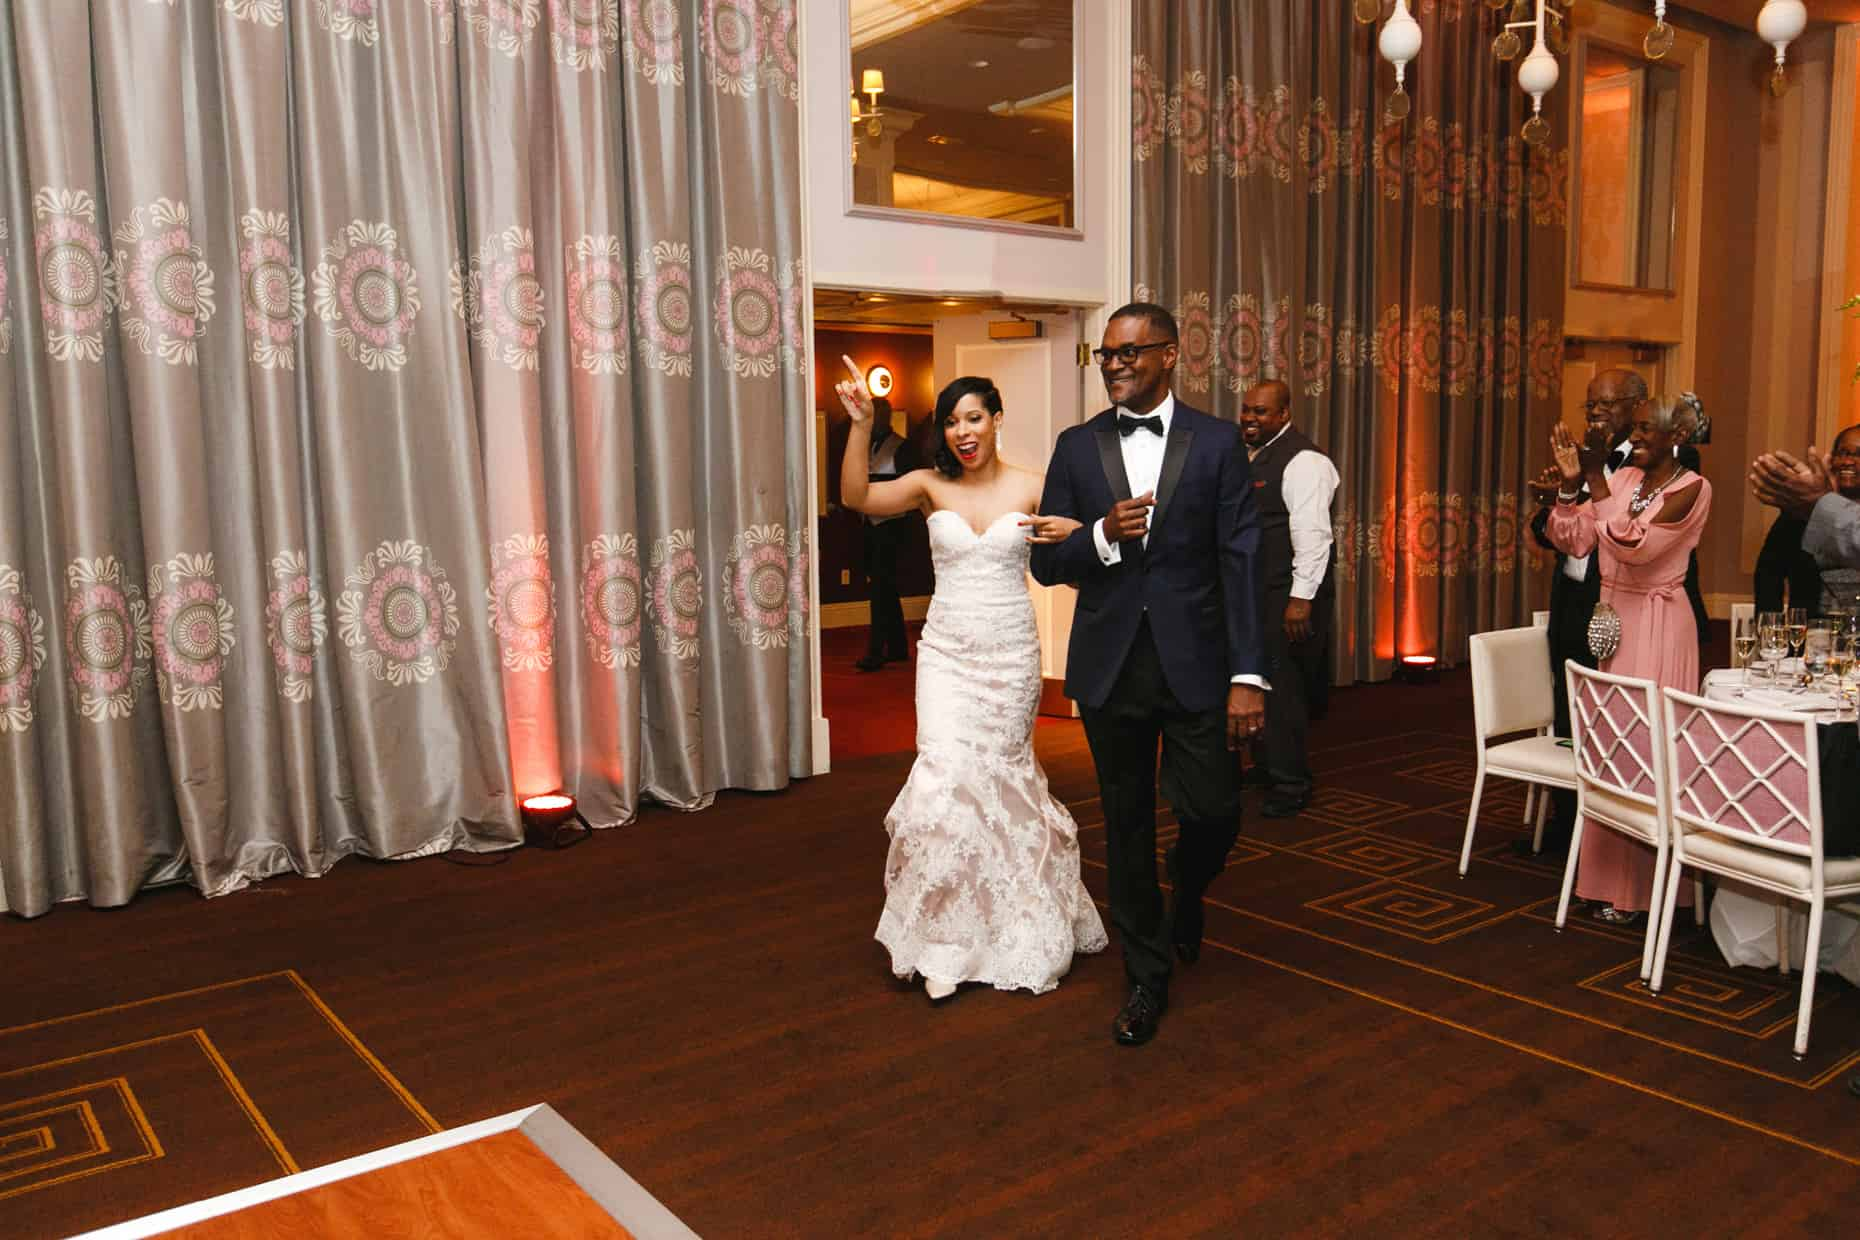 Lafayette South Ballroom Wedding Photo